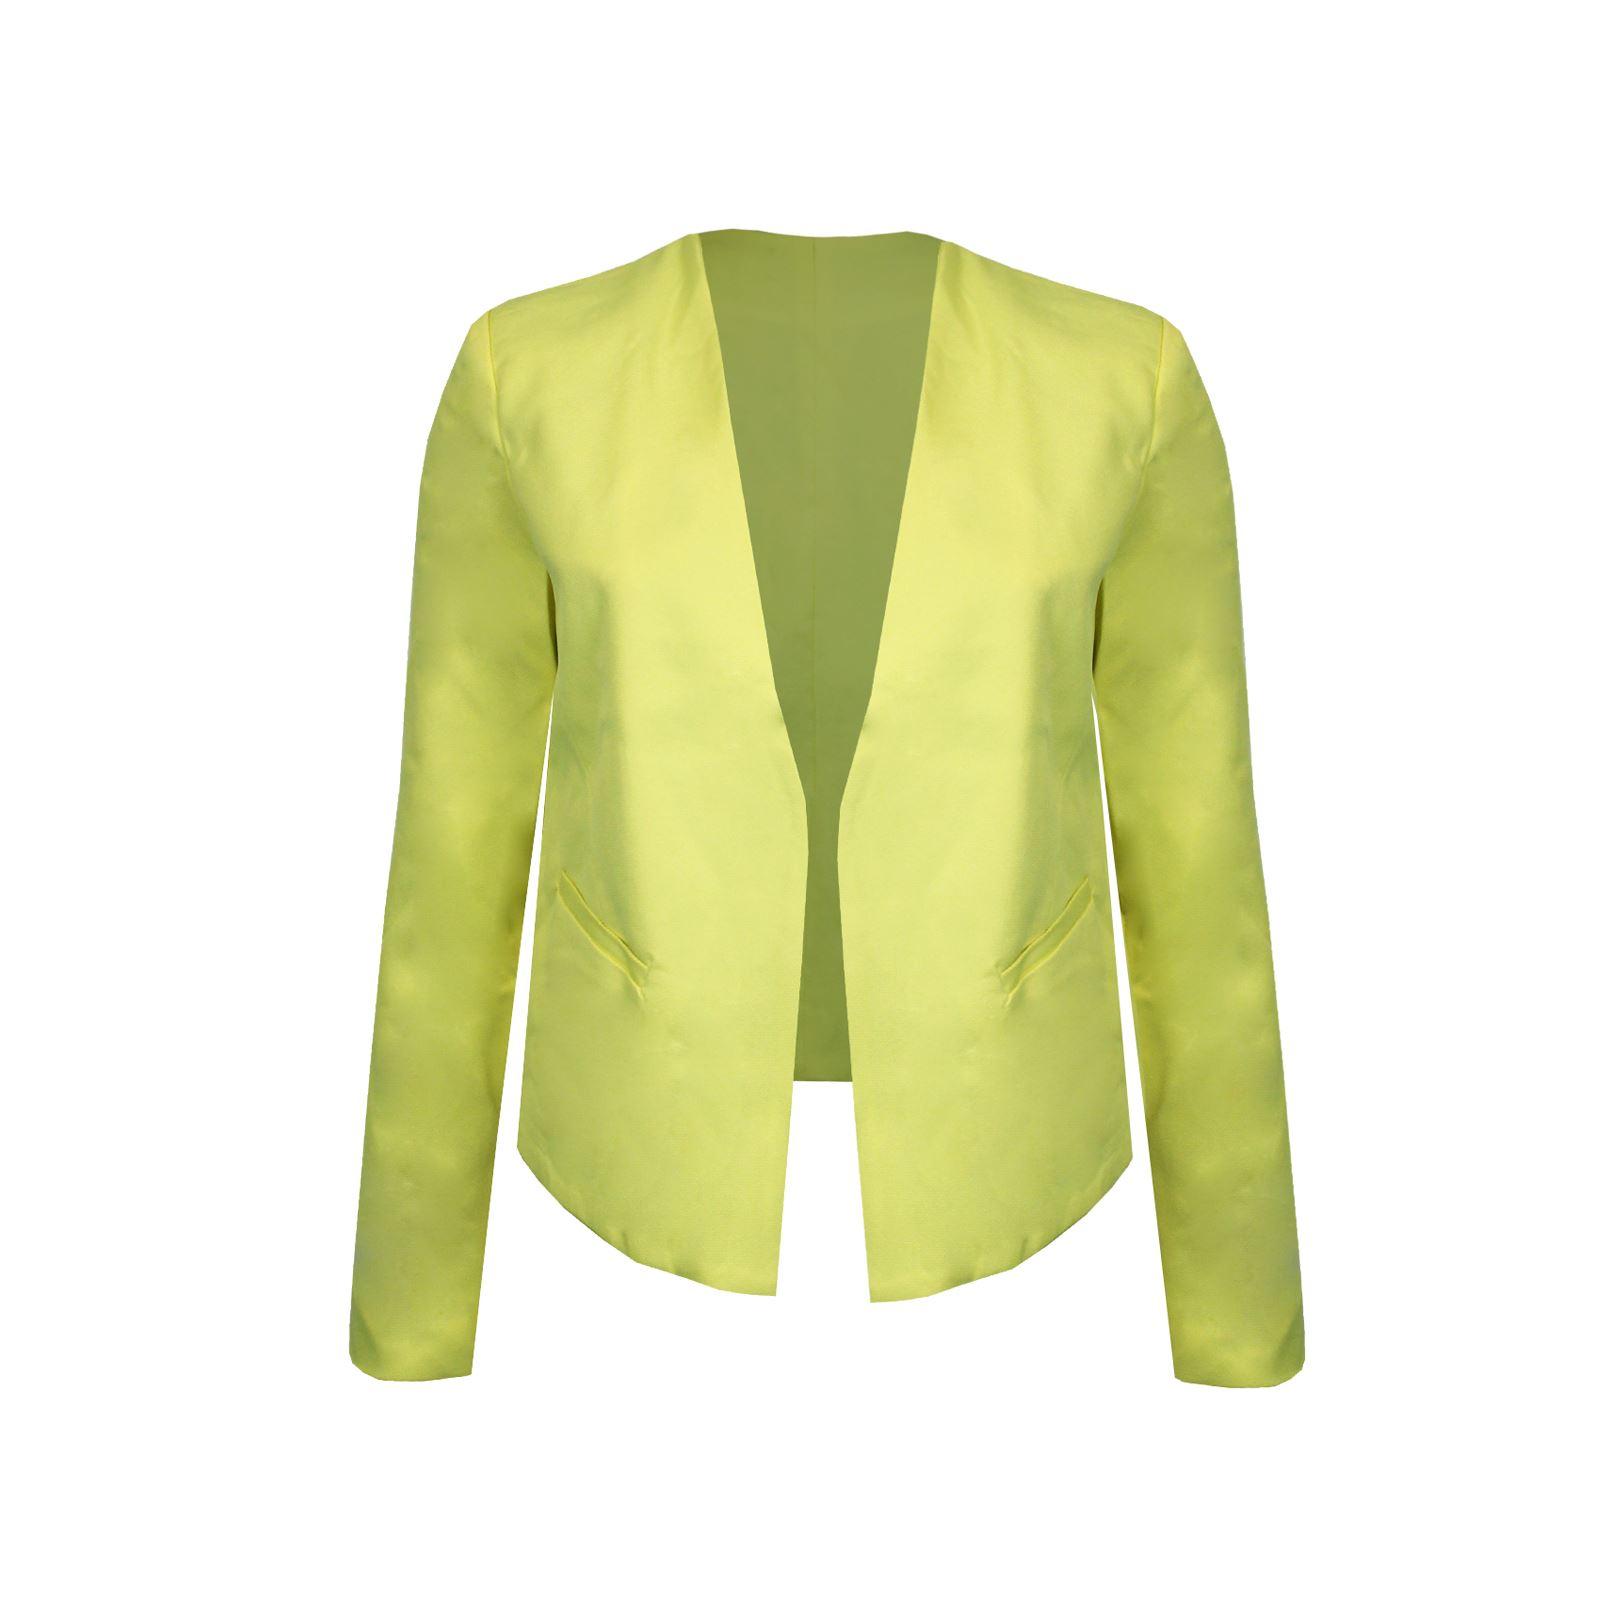 Womens Long Sleeve Ponte Collarless Fully Lined Jet Pocket Formal Jacket Blazer | EBay